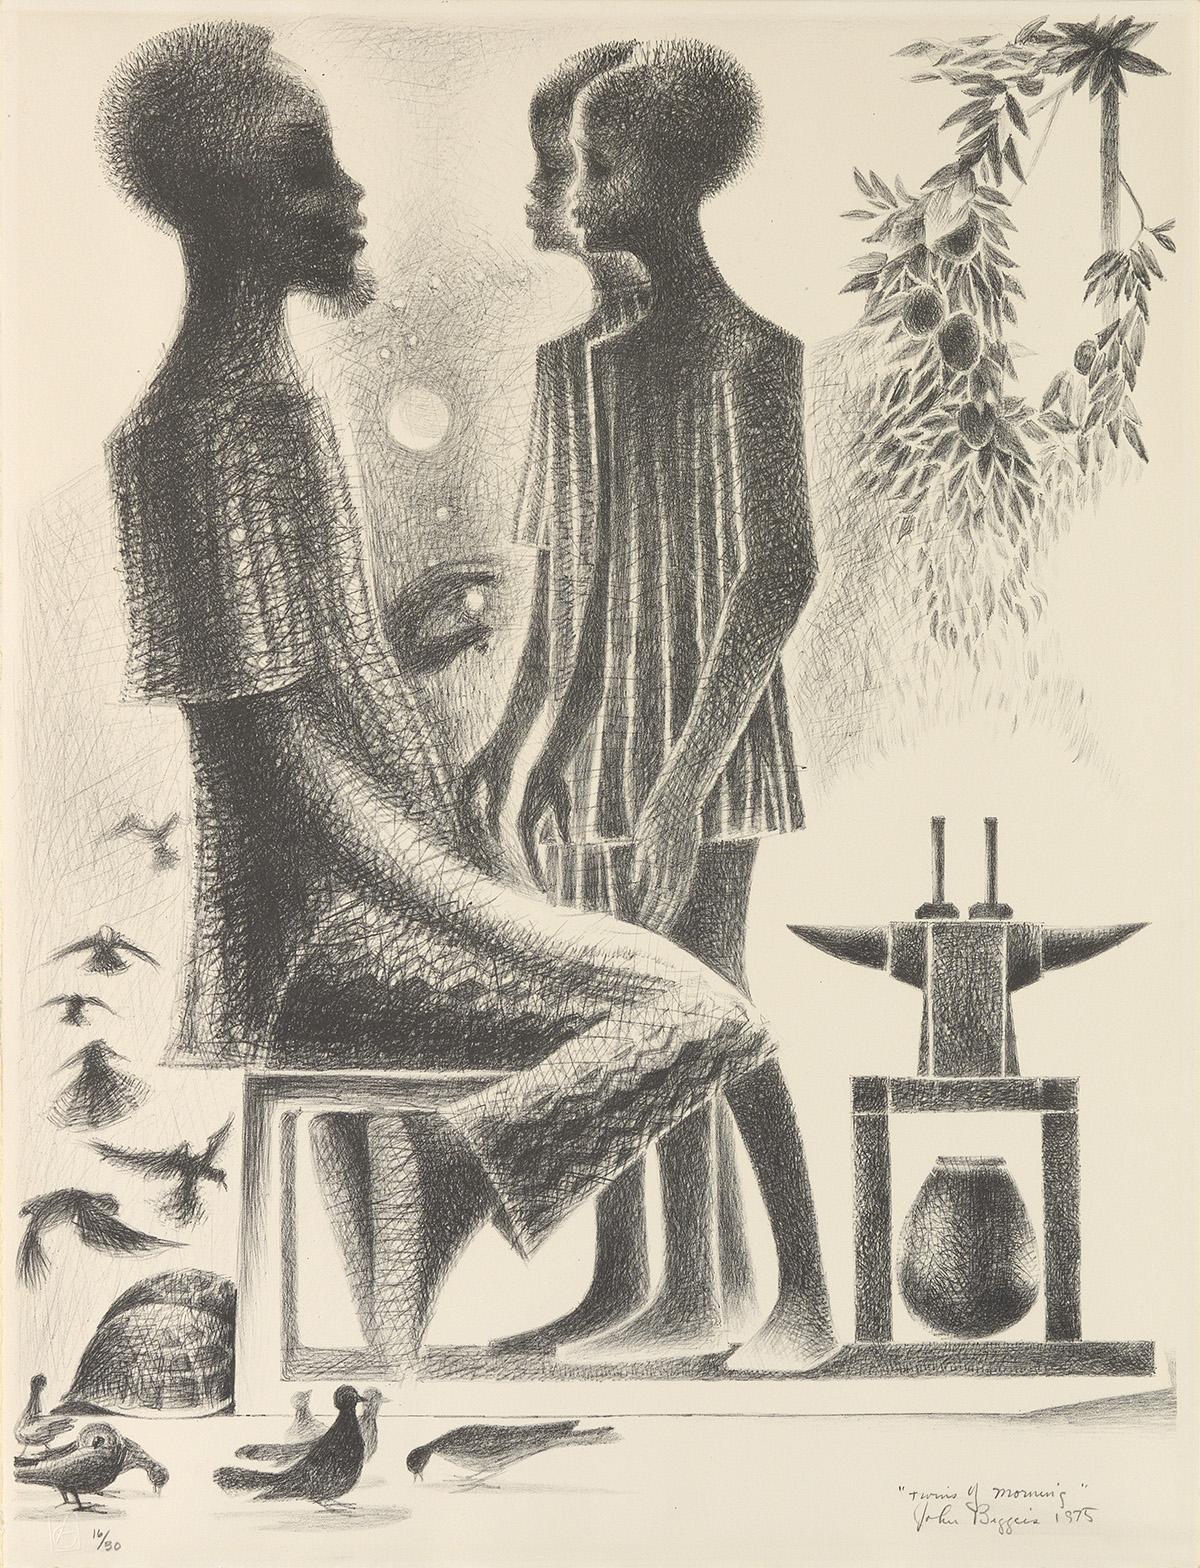 JOHN BIGGERS (1924 - 2001) Twins of Morning.